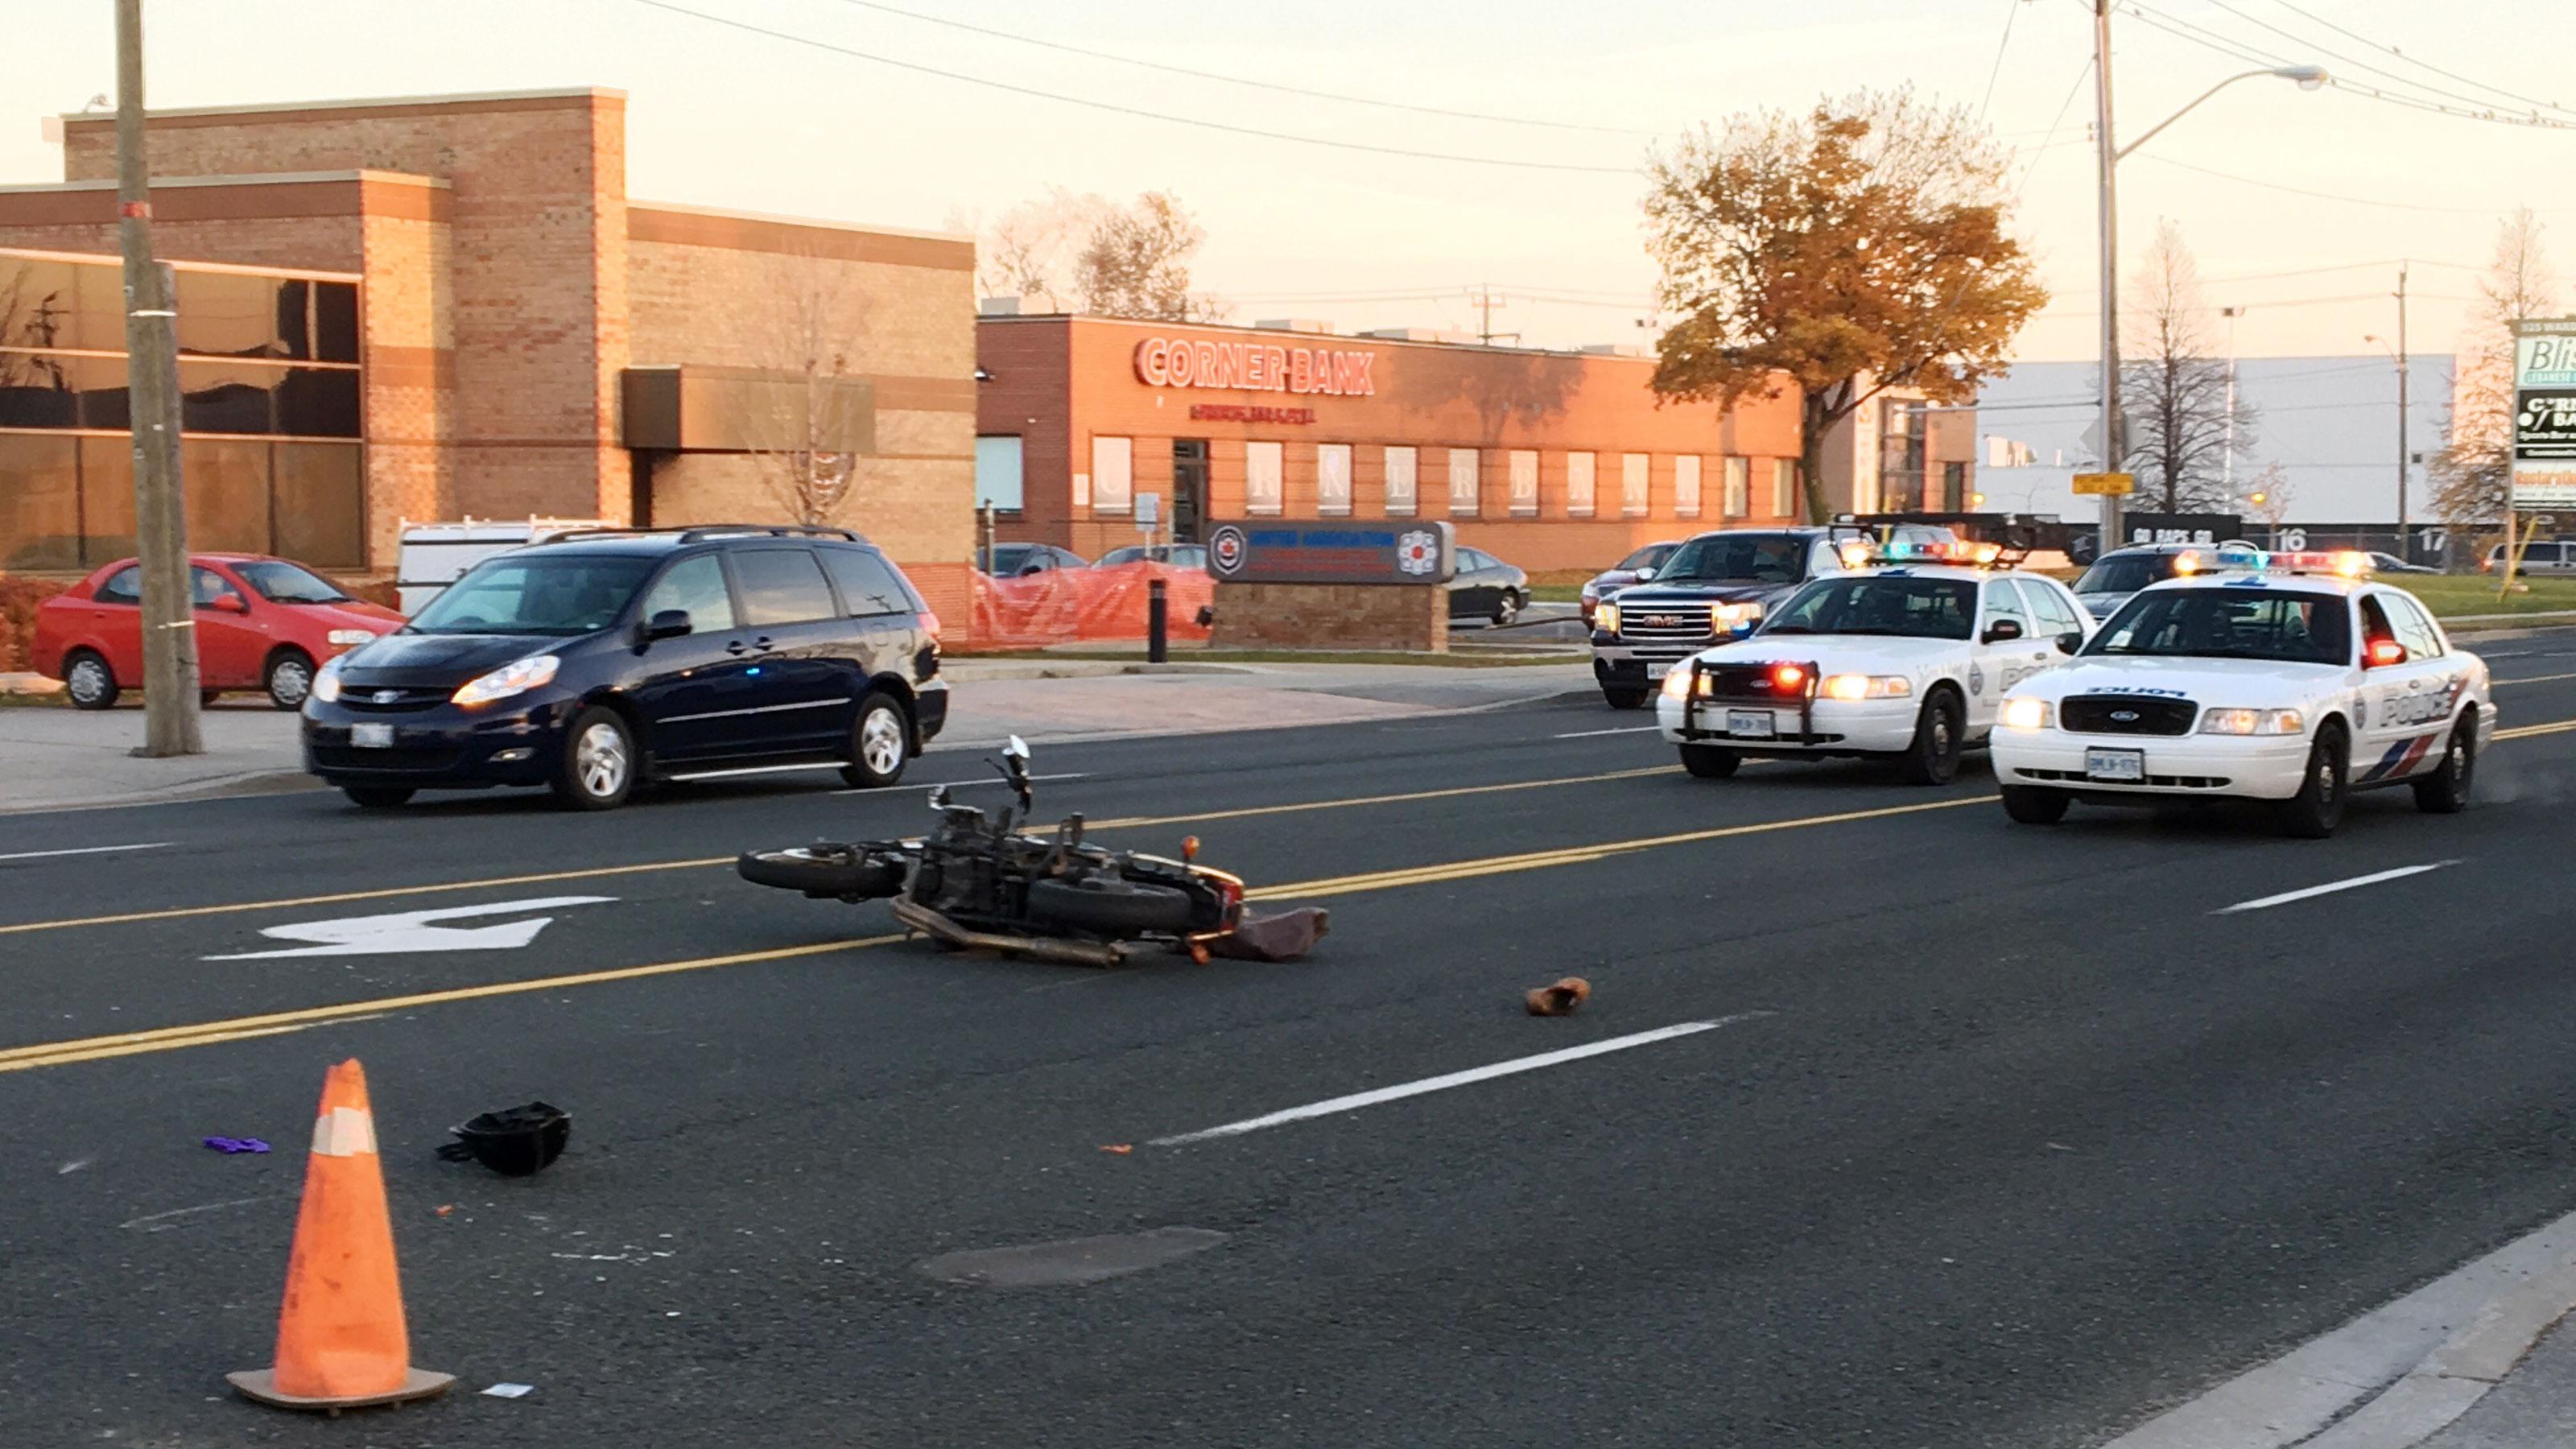 Motorcyclist injured in Scarborough crash